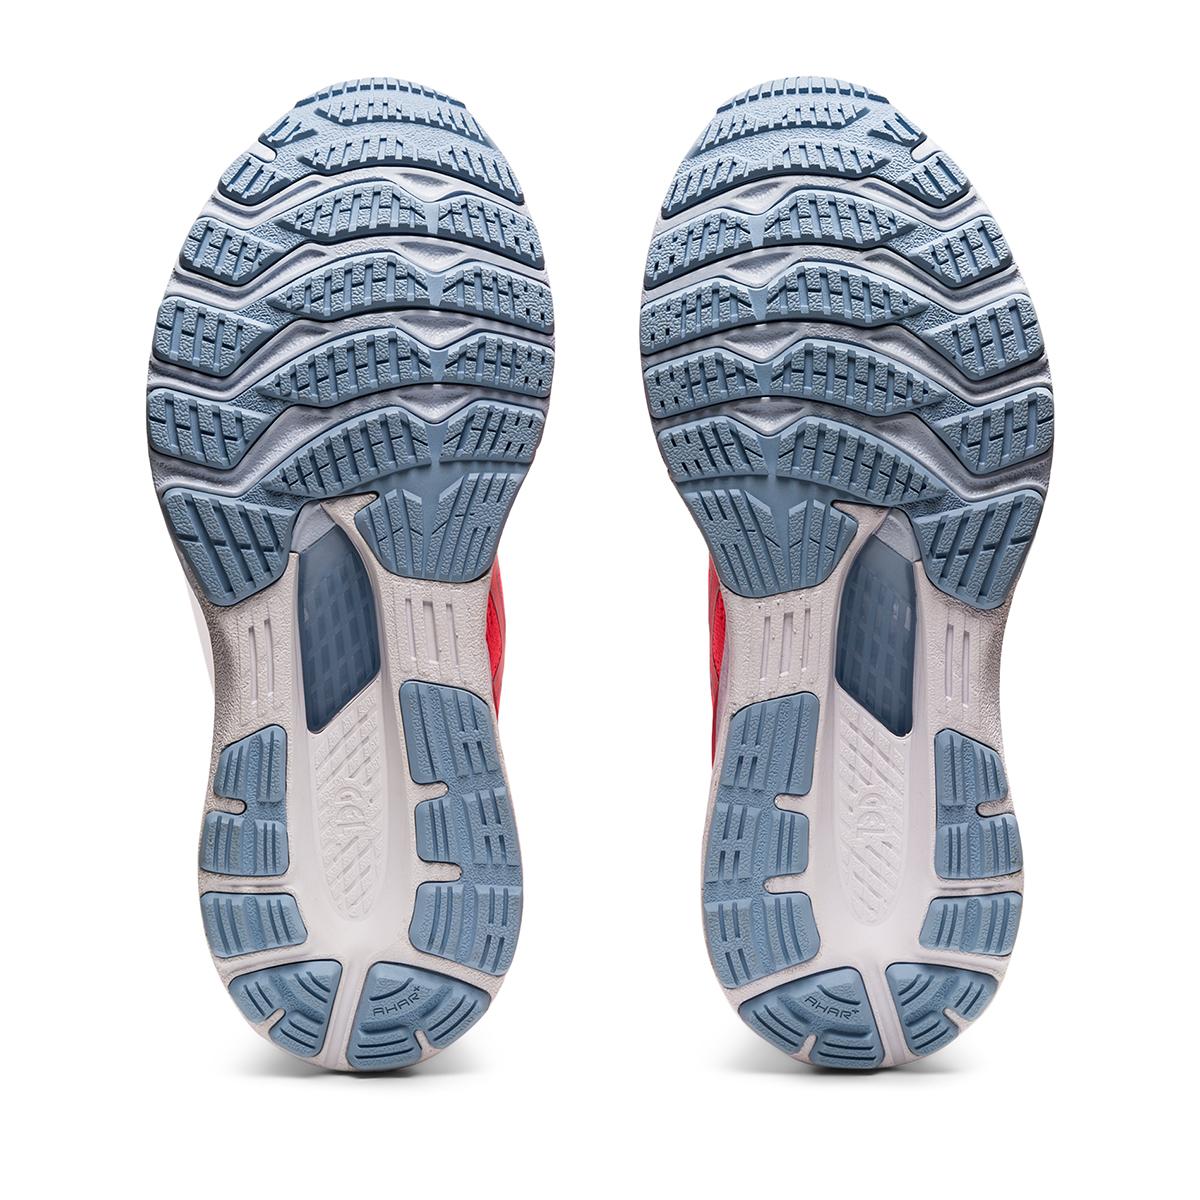 Women's Asics Gel-Kayano 28 Running Shoe - Color: Blazing Coral - Size: 5 - Width: Regular, Blazing Coral, large, image 4